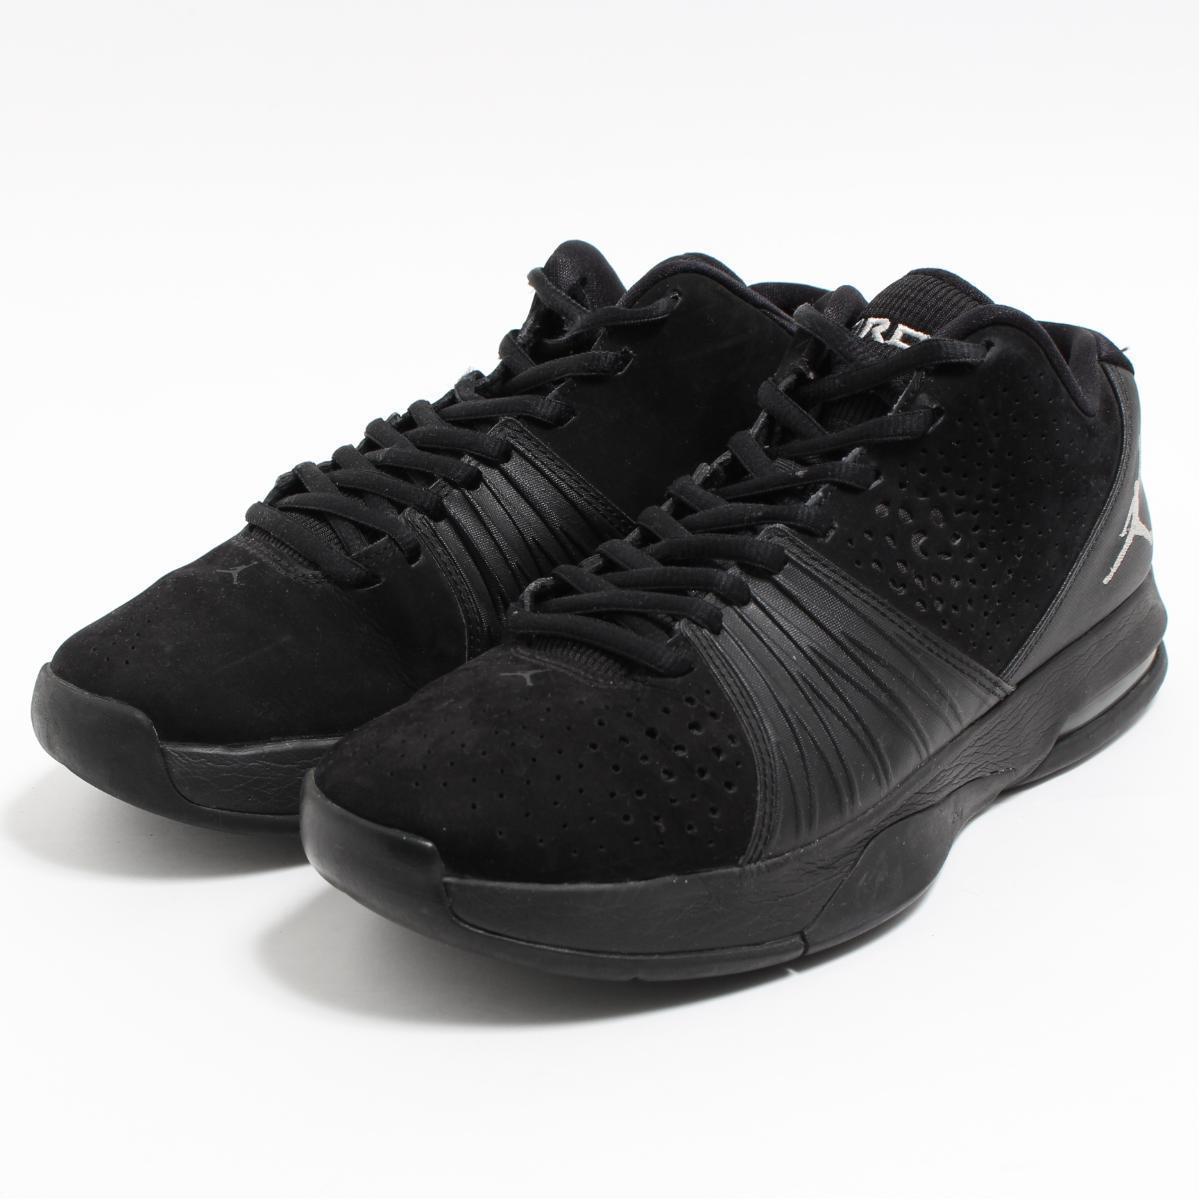 c817c3a81b468d VINTAGE CLOTHING JAM  Nike NIKE AIR JORDAN 5 AM sneakers US8 men ...